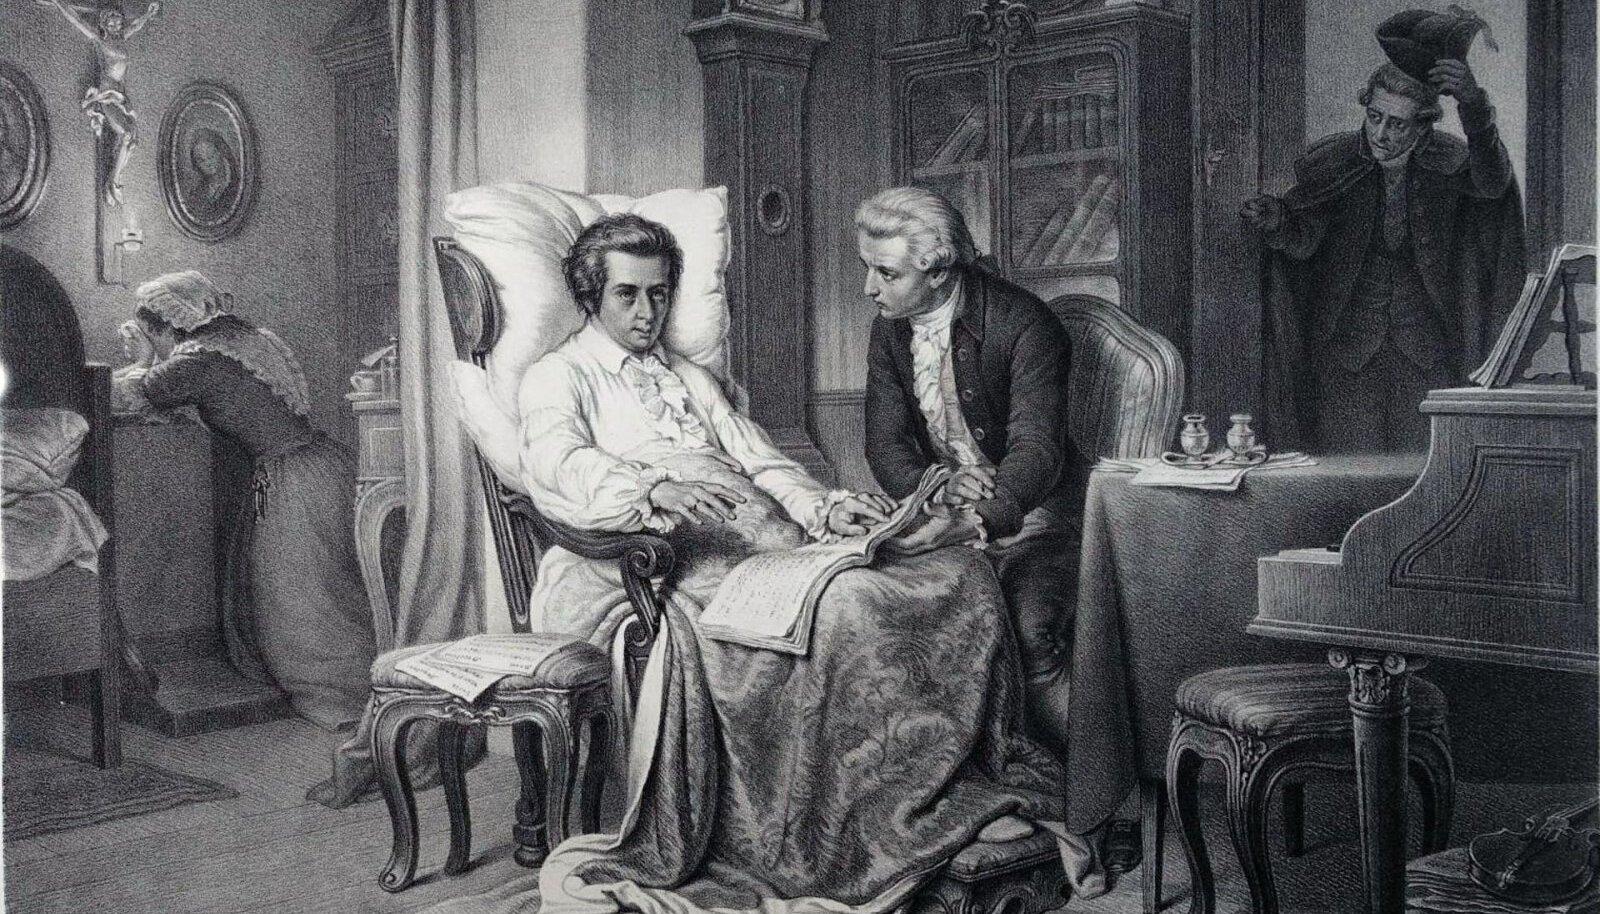 Franz Schrammi joonistus Mozartist tolle viimastel päevadel (Pilt: Wikimedia Commons)